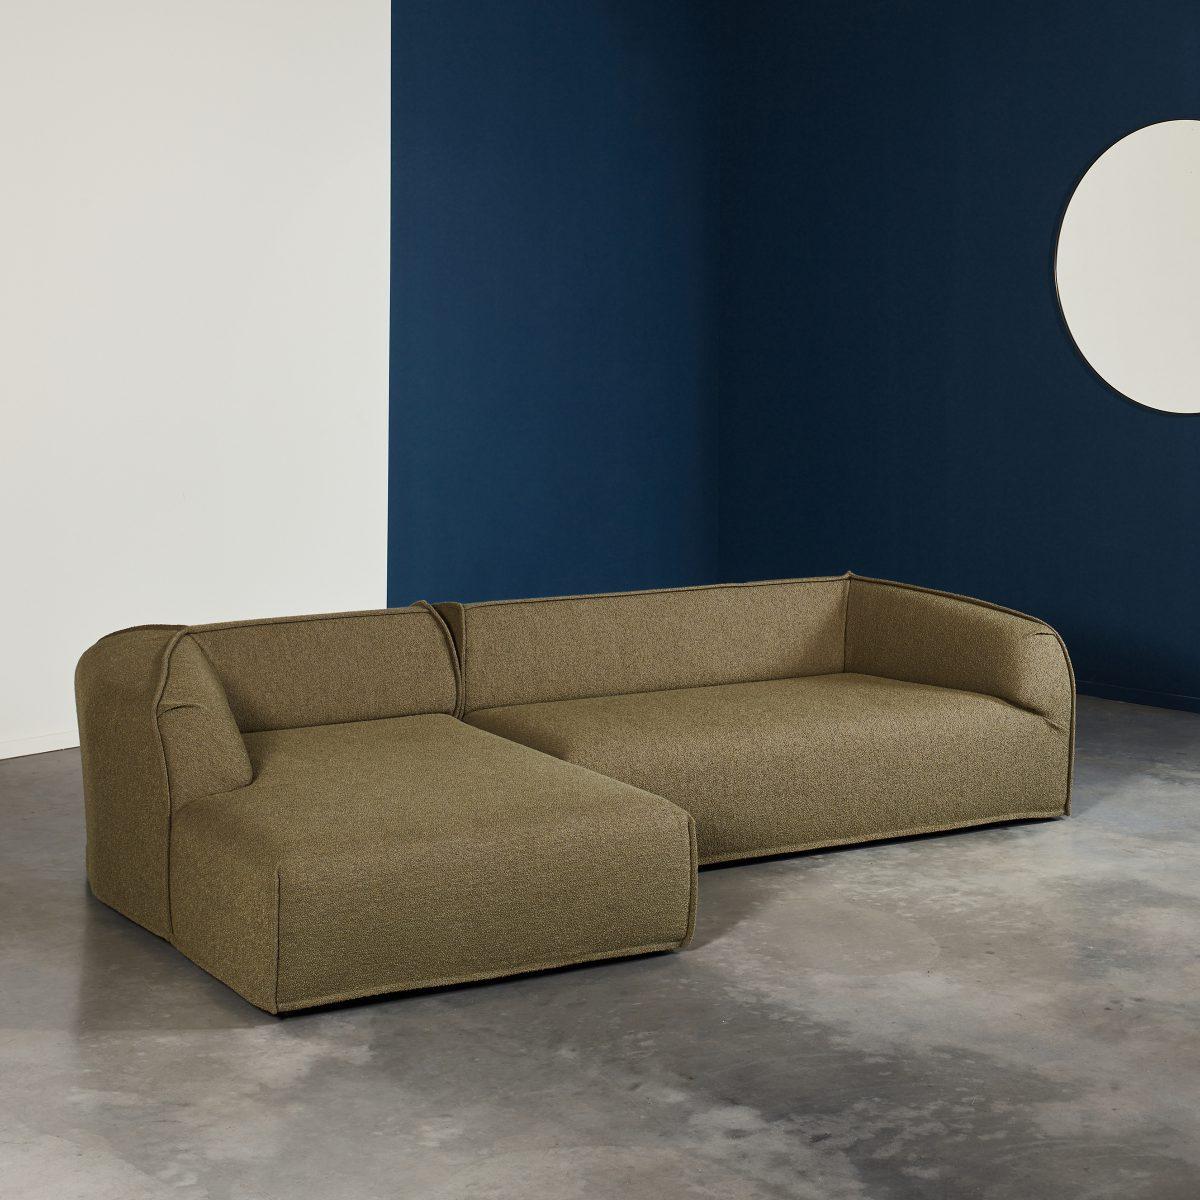 M.A.S.S.A.S Sofa